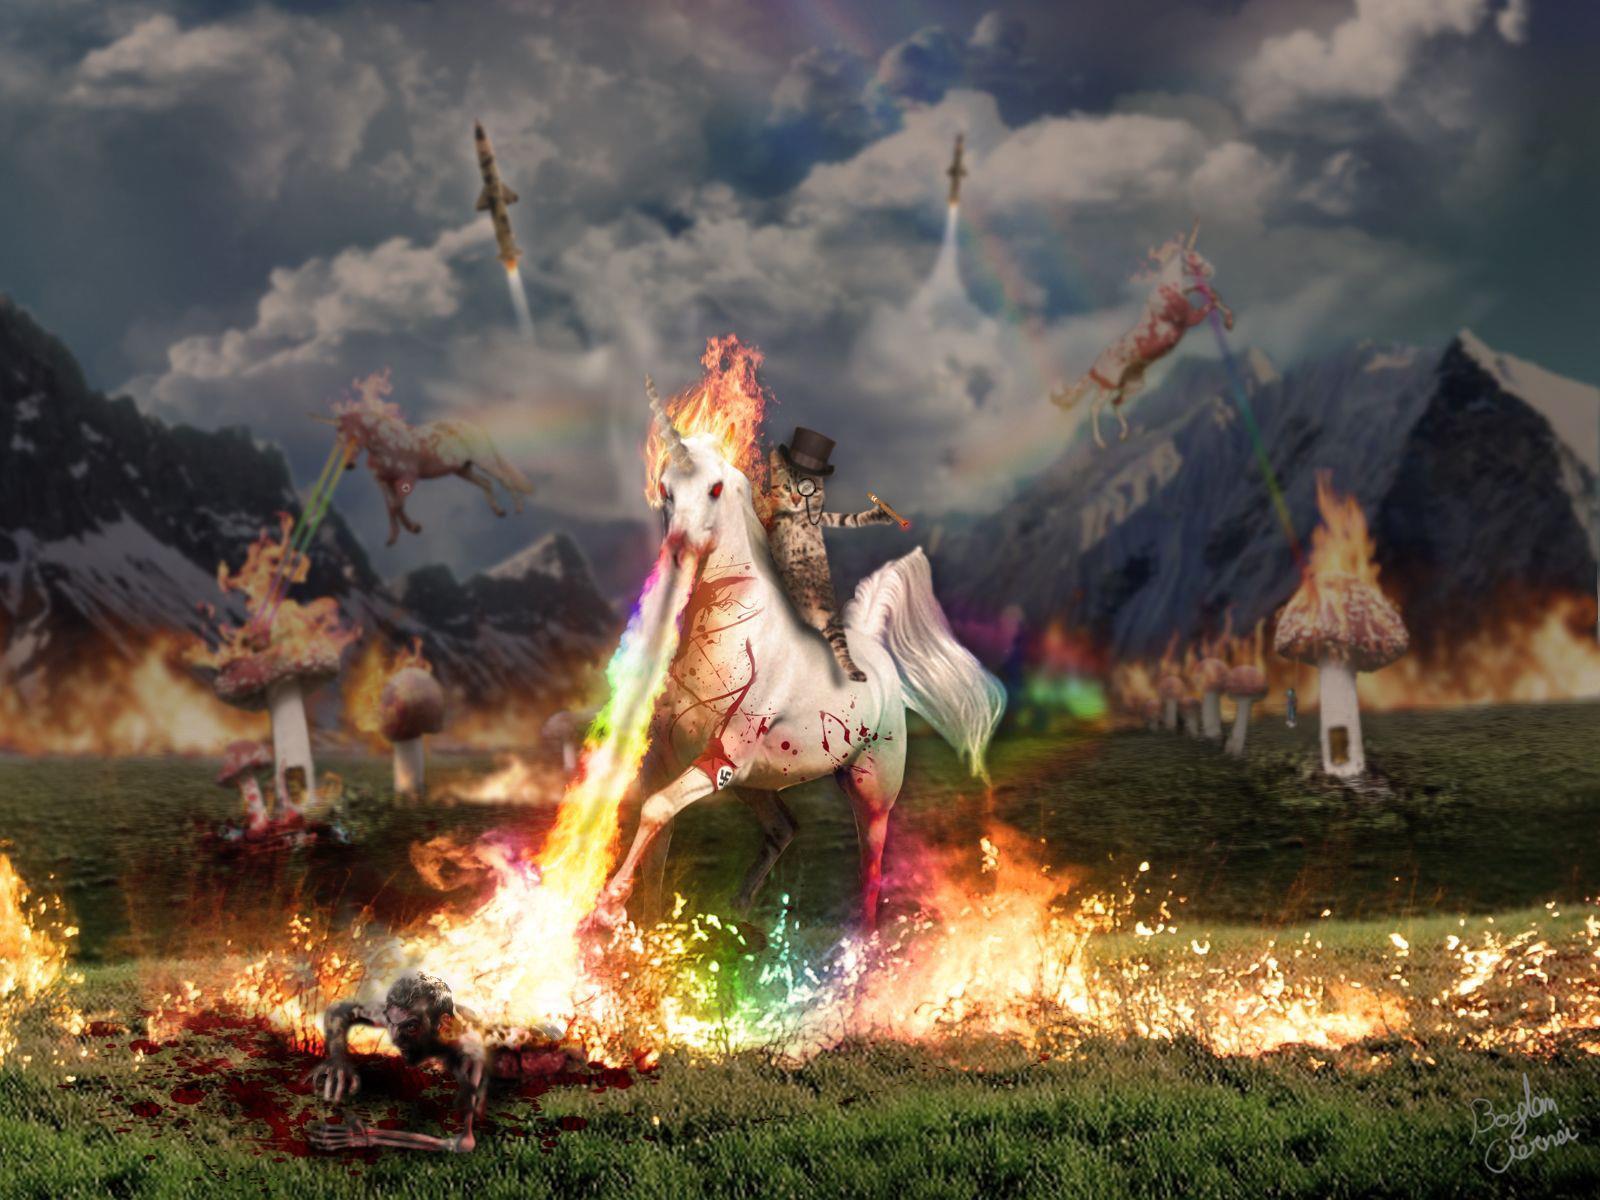 unicorn, fire breathing, awesome, win, art, wtf